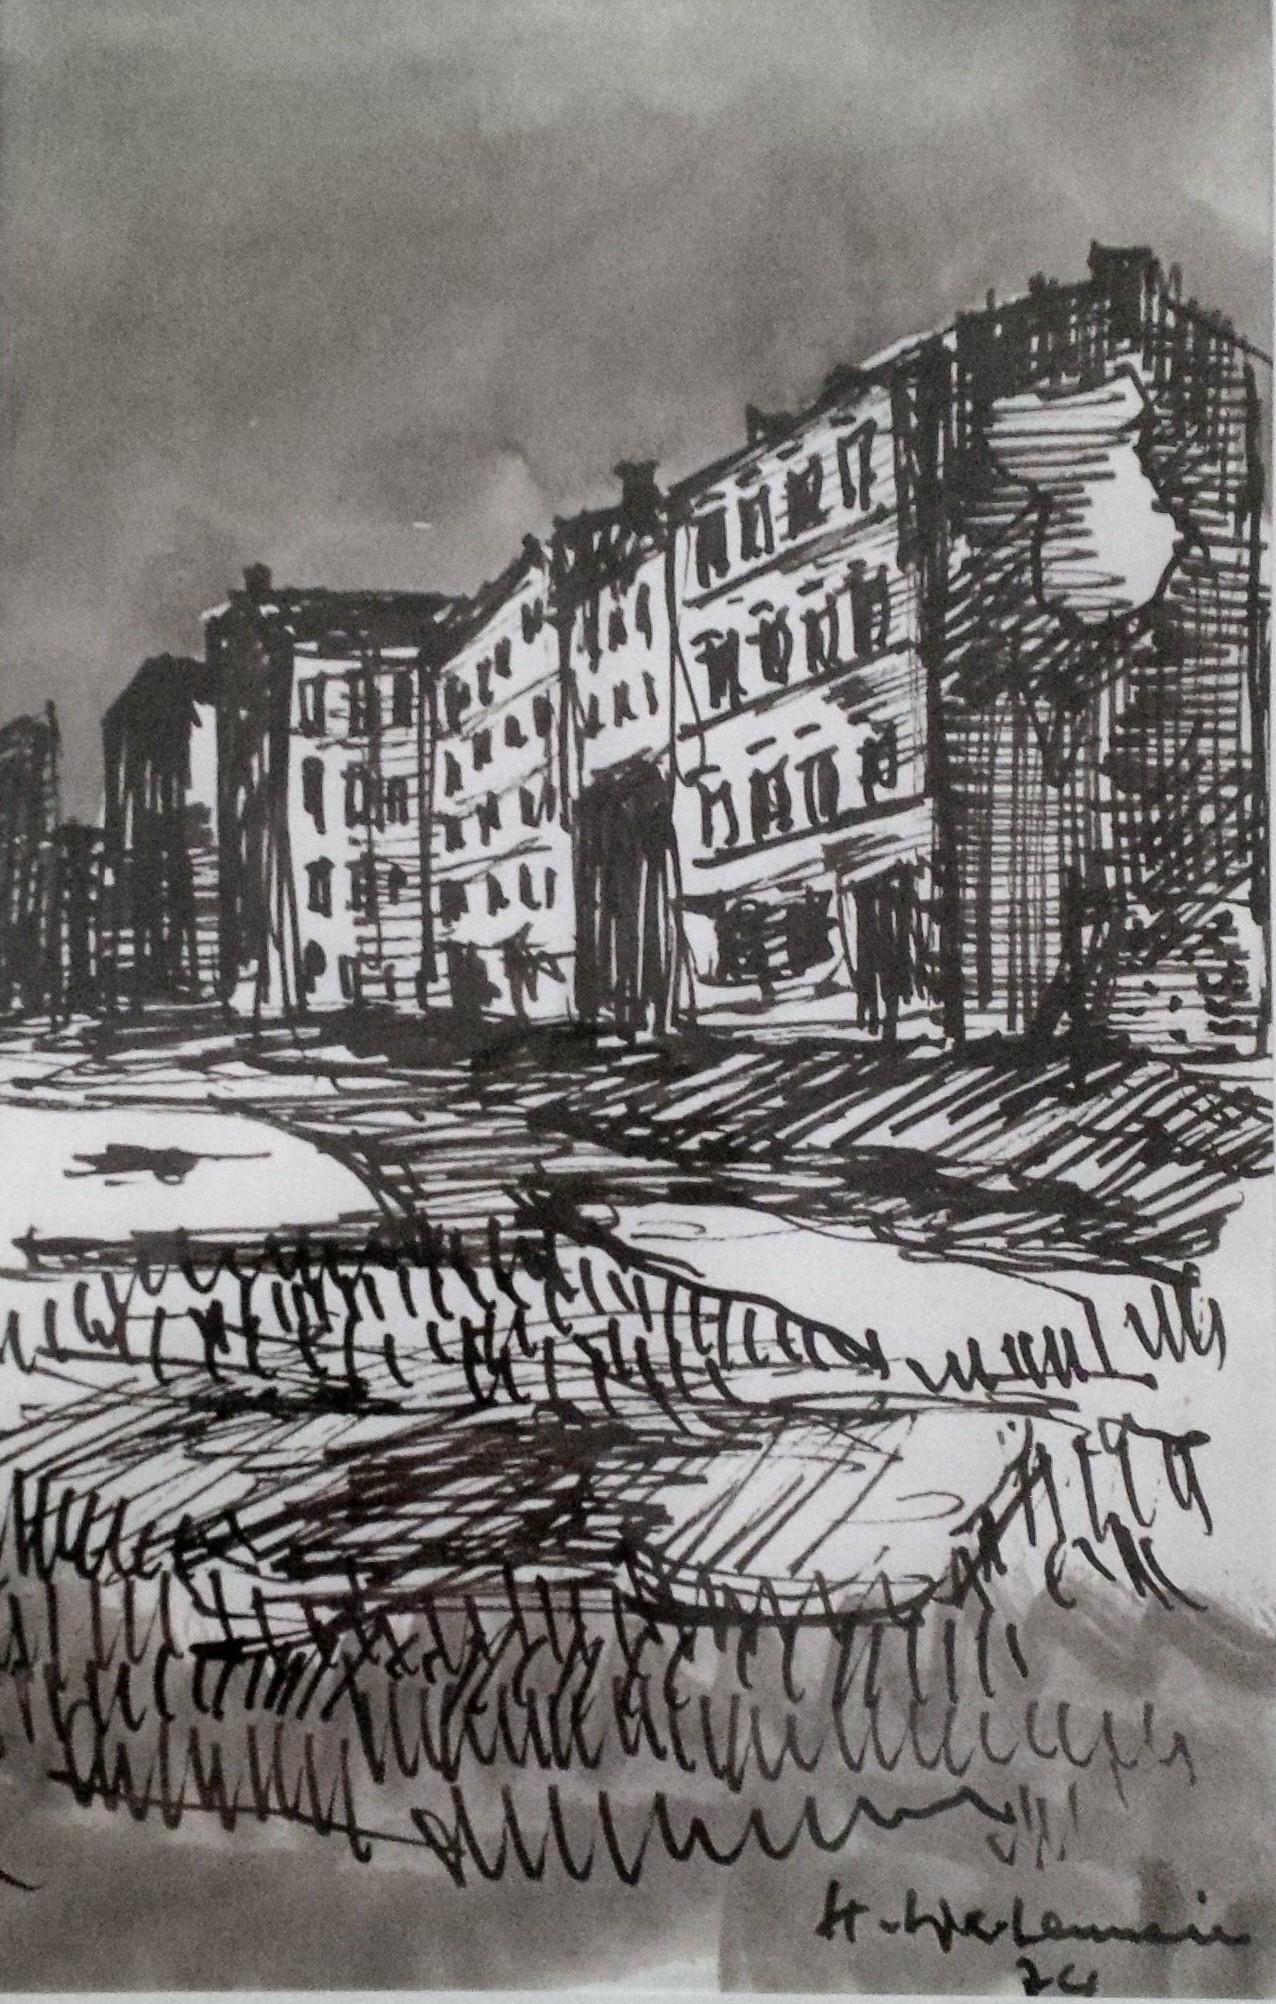 Federzeichnung (1974)